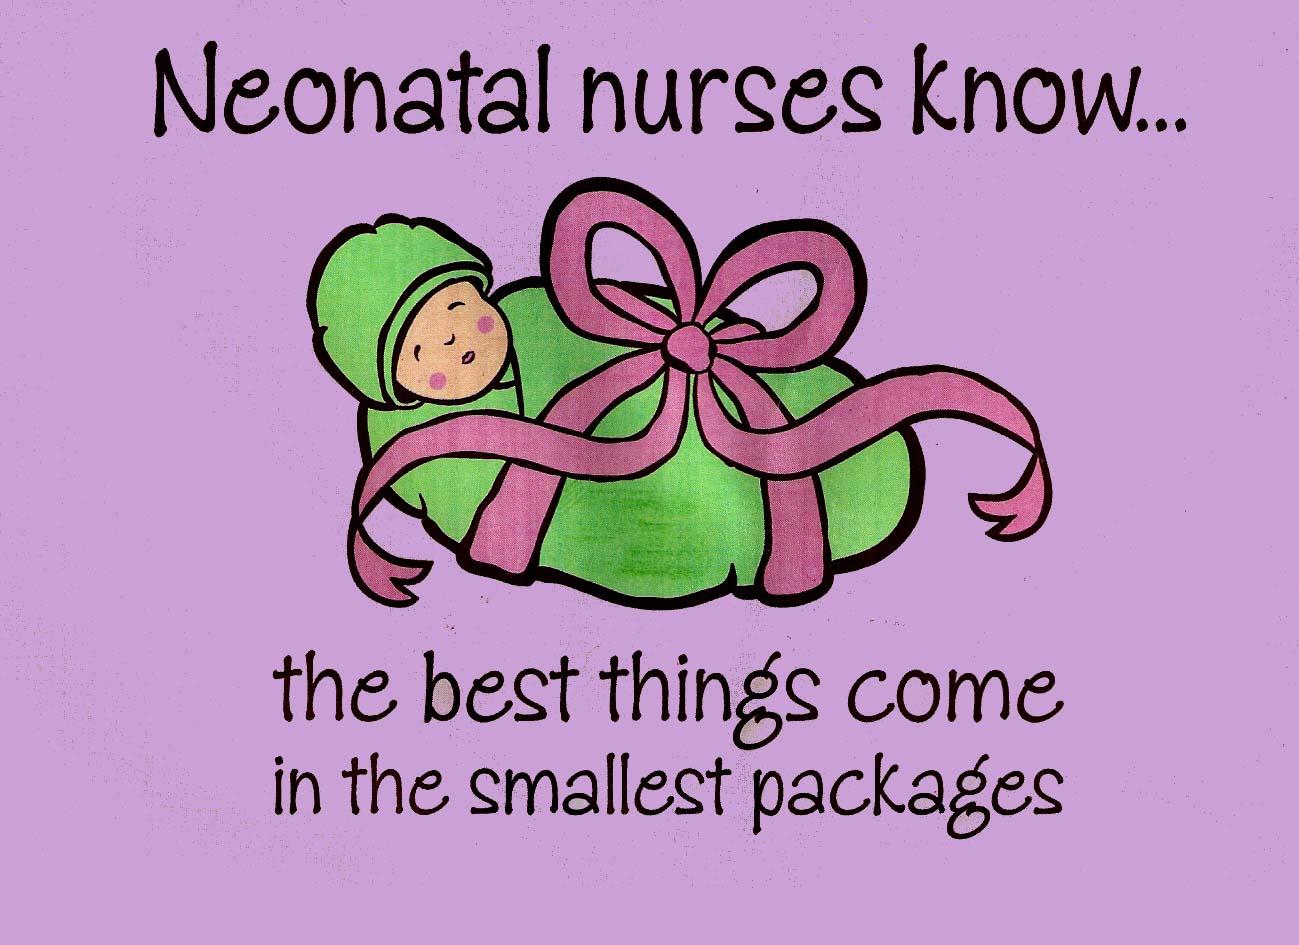 neonatal nurse logo submited images